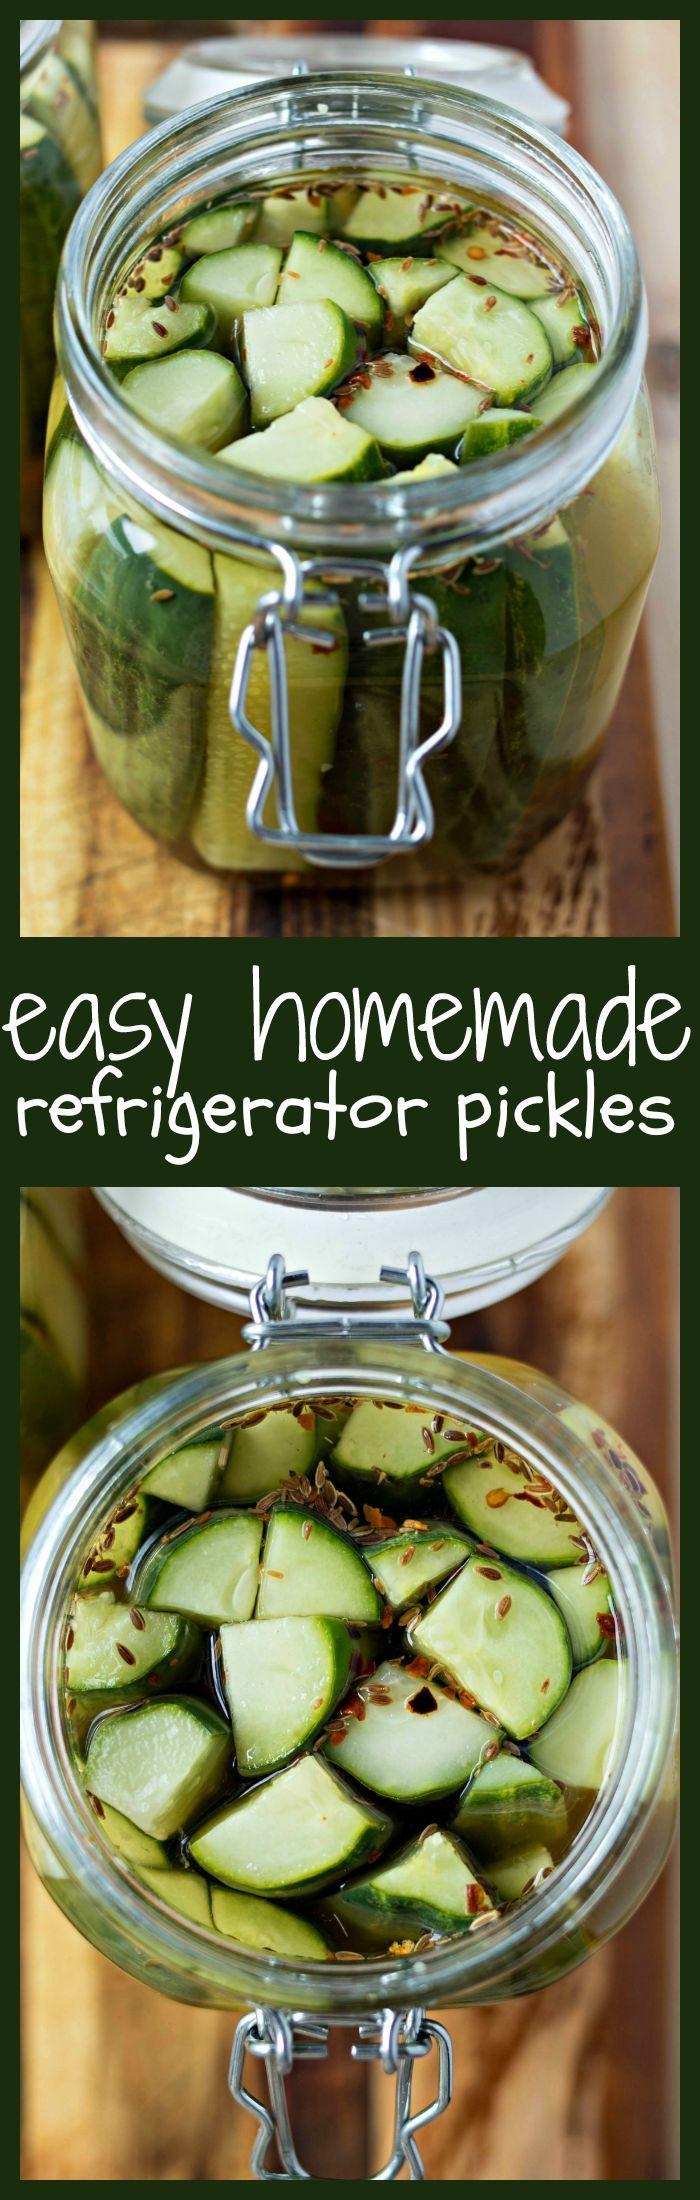 Easy Homemade Refrigerator Pickles – CPA: Certified Pastry Aficionado